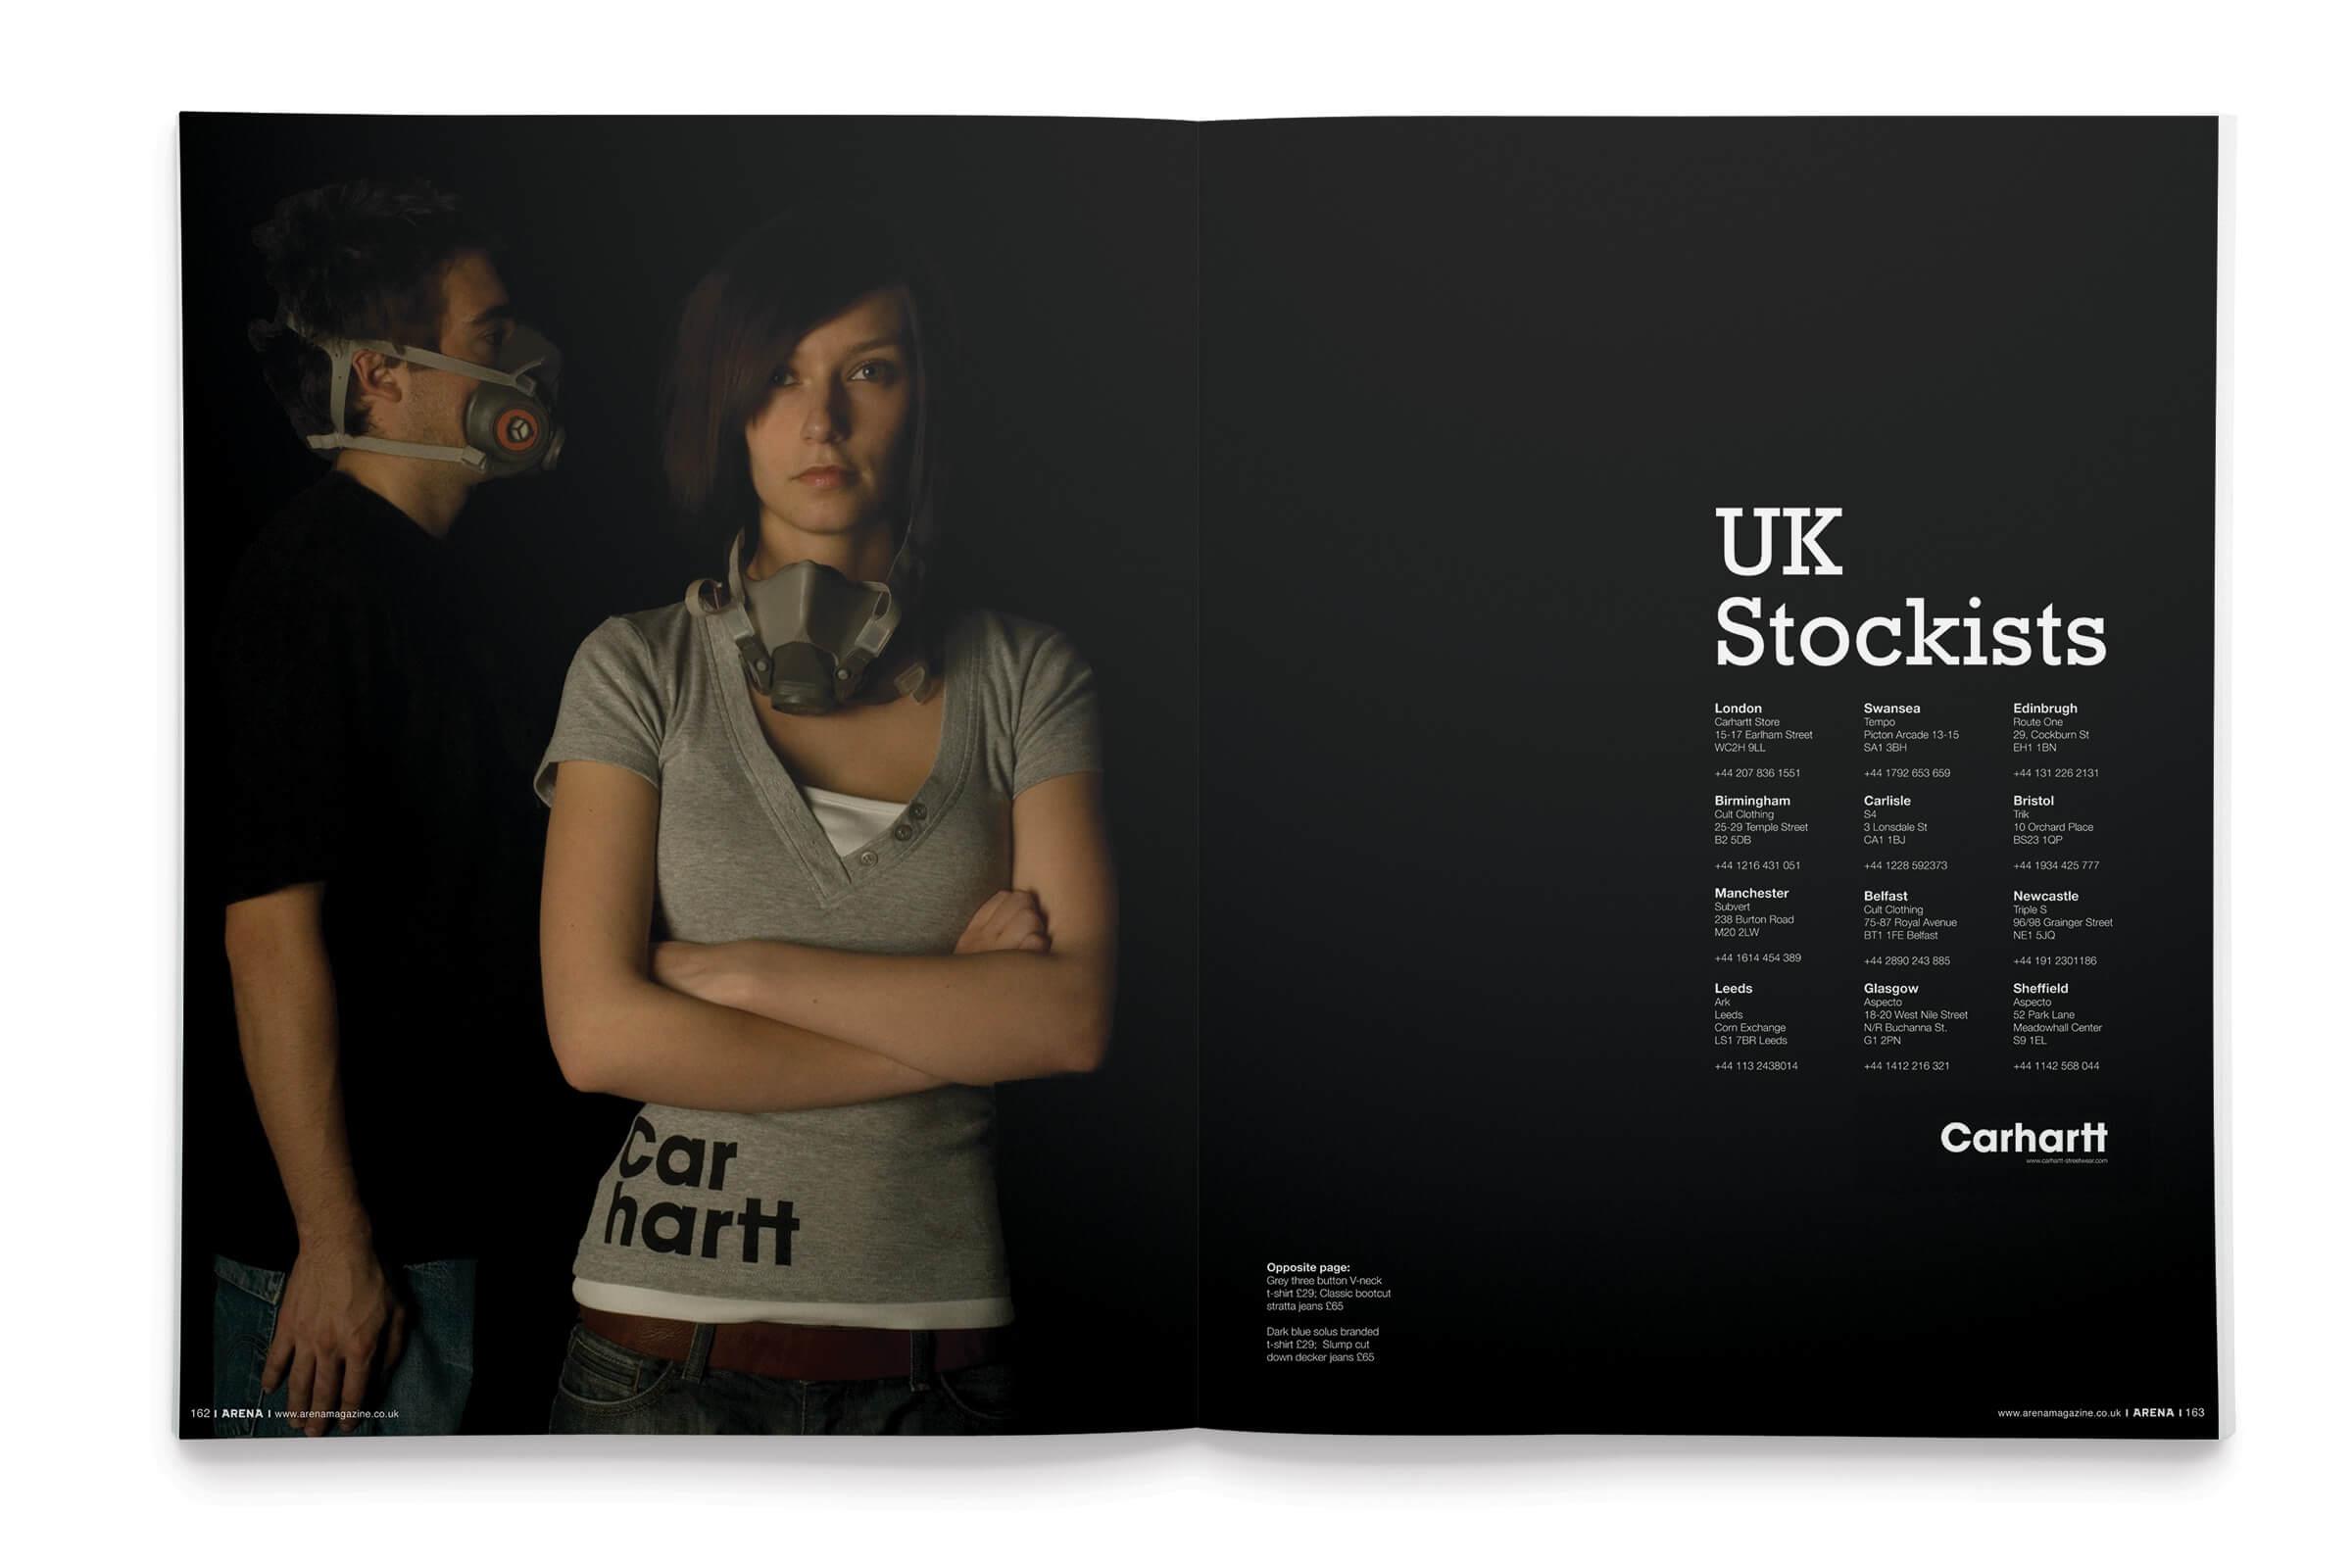 Arena Magazine-Carhartt spread 4